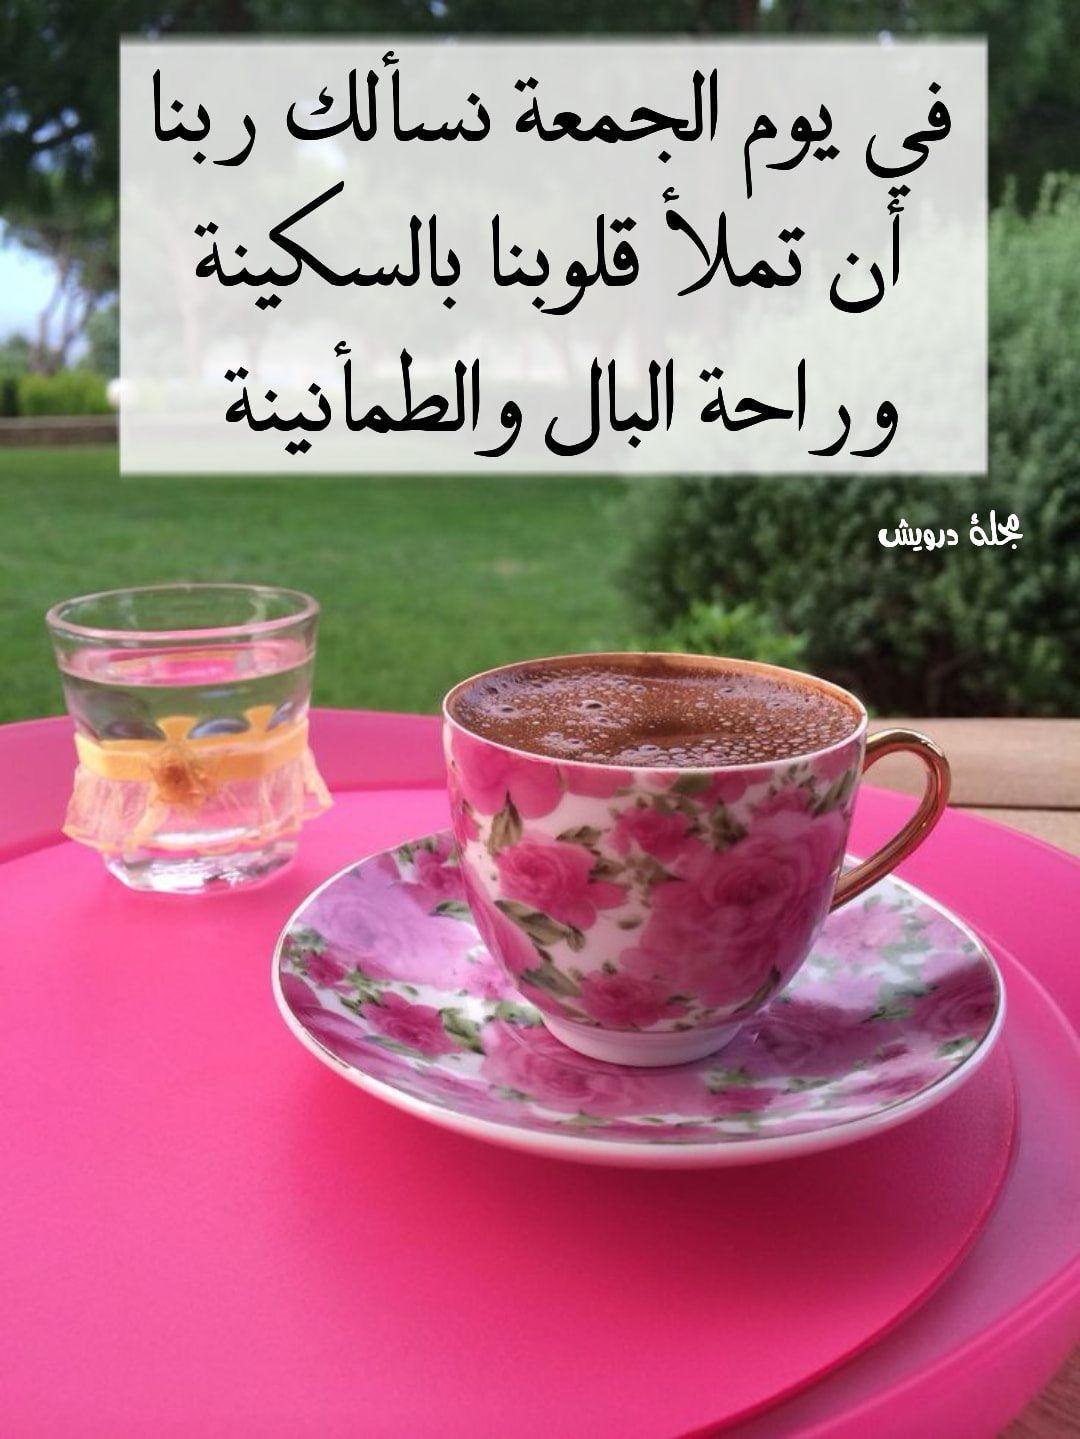 Pin By راقي الحرف On الدعاء المستجاب Tea Cups Glassware Tableware